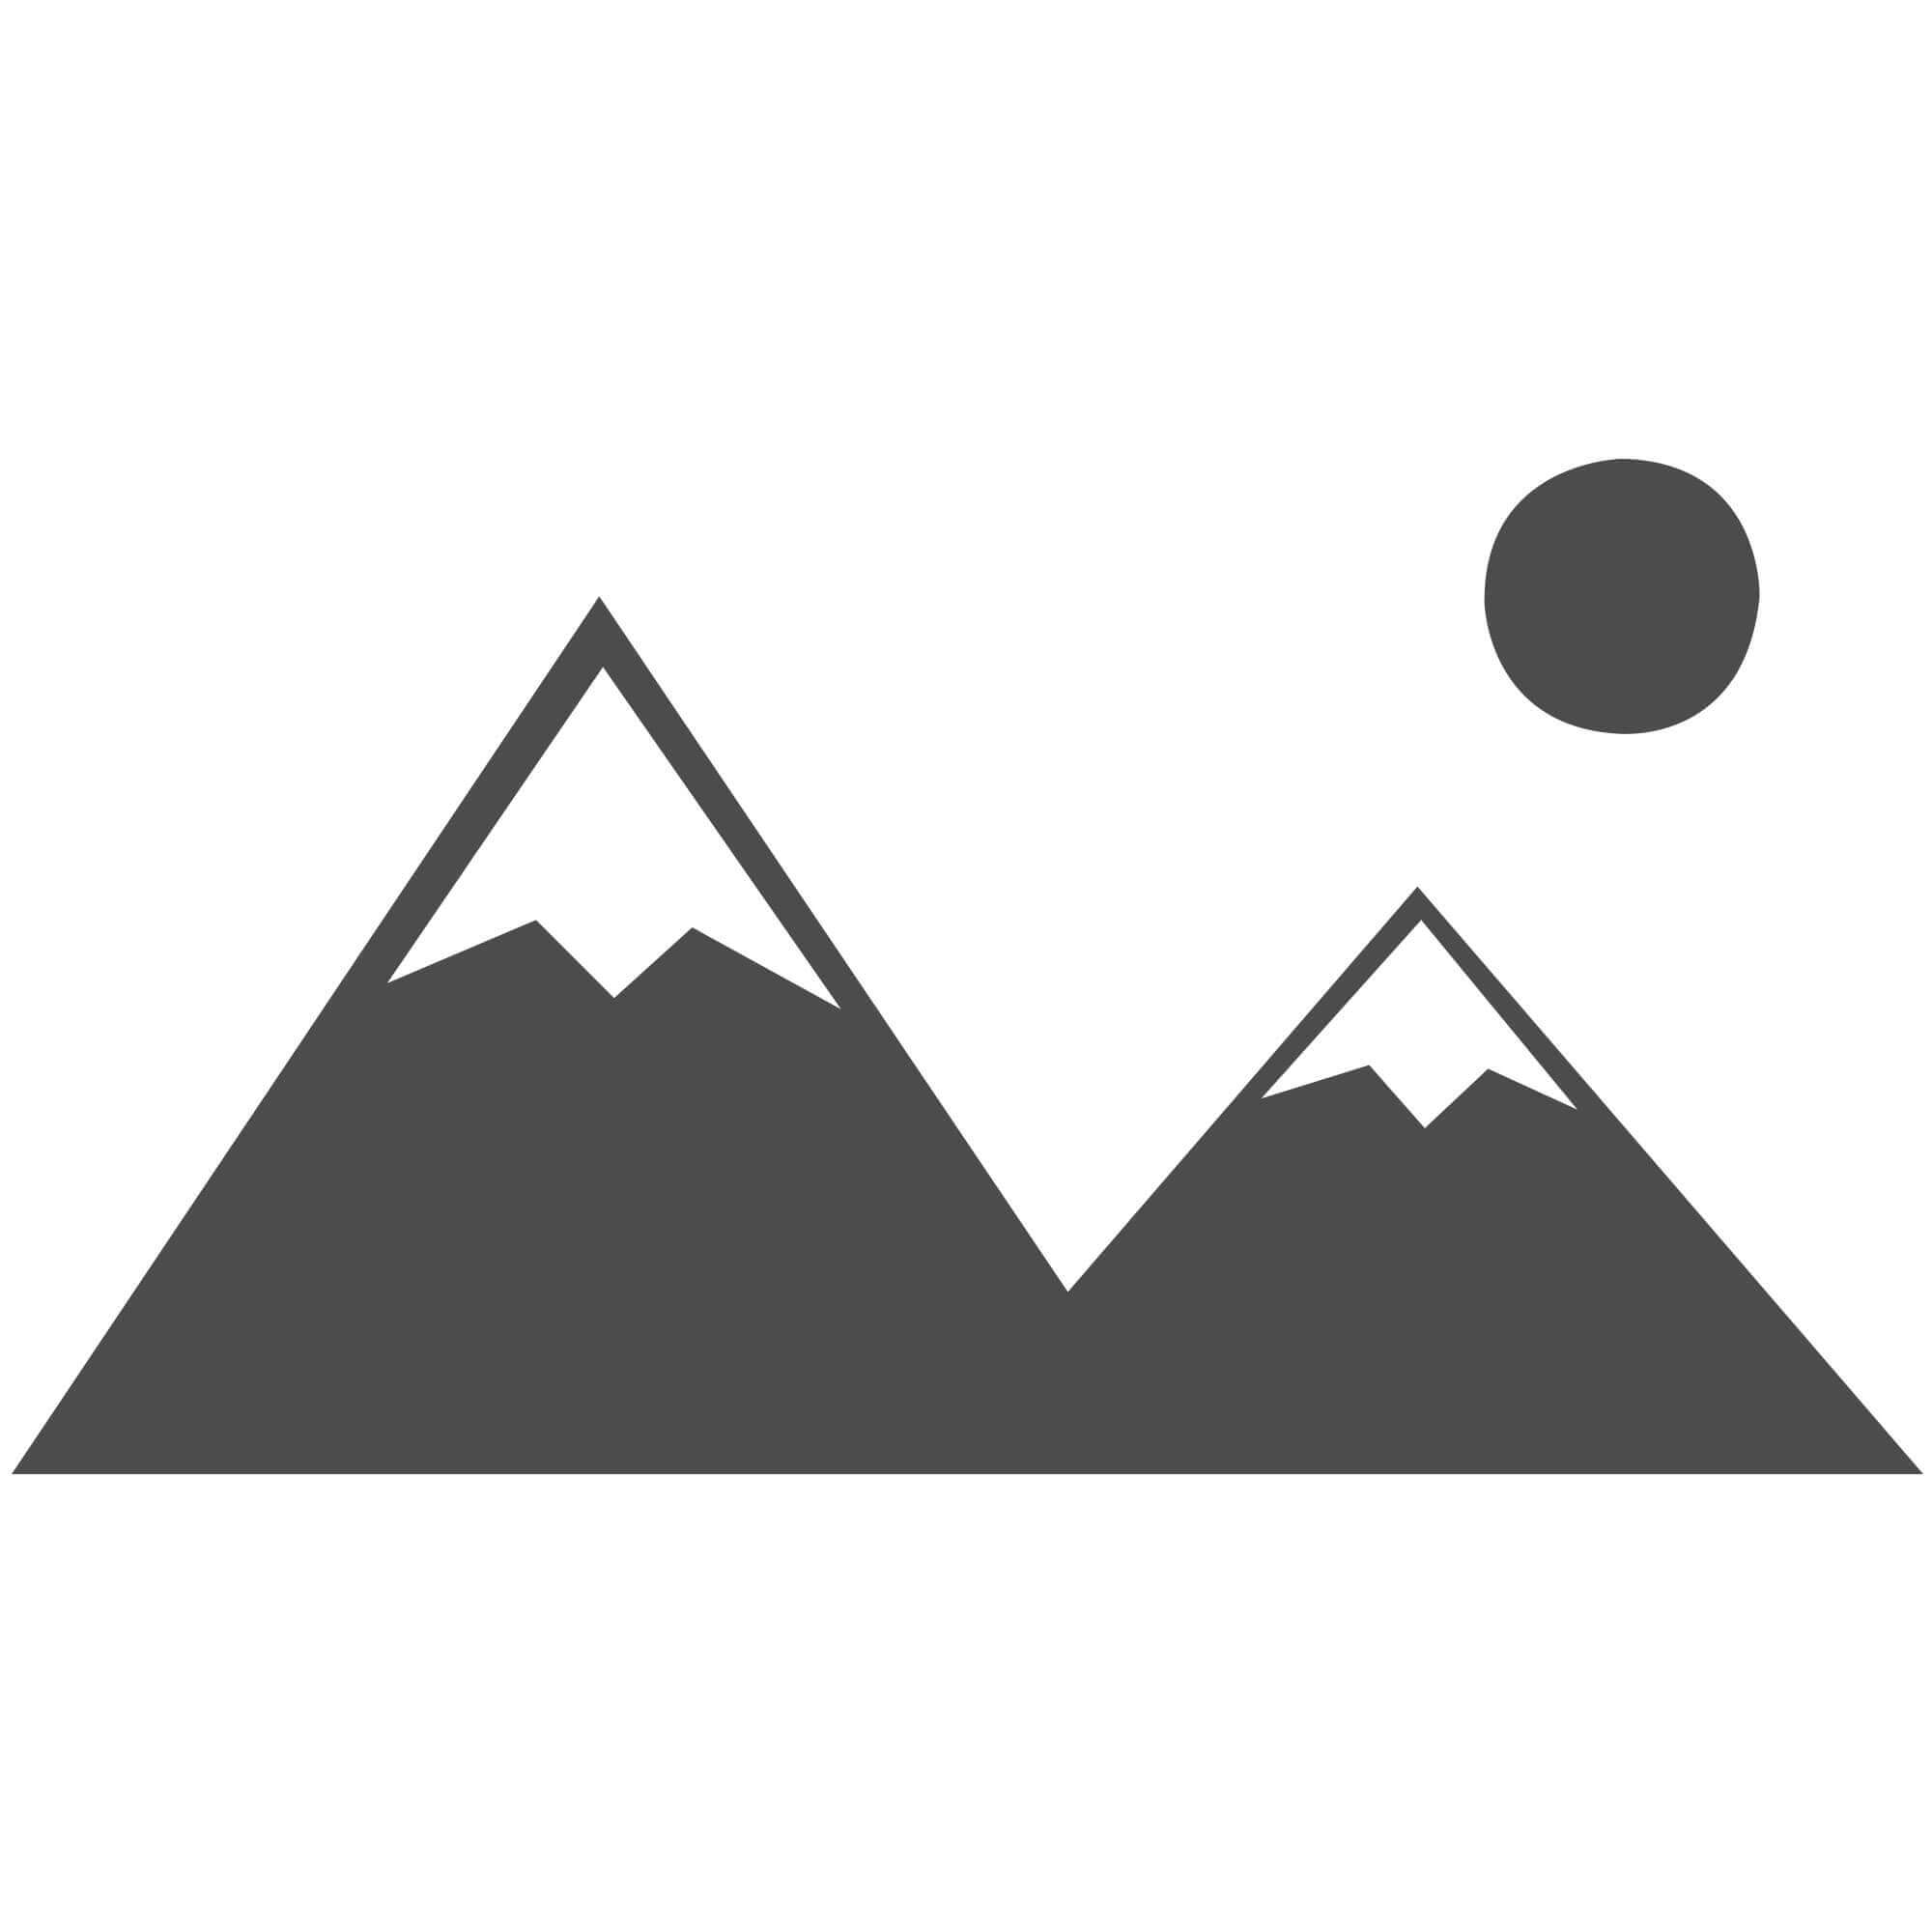 RHINO HEX 45 canopy